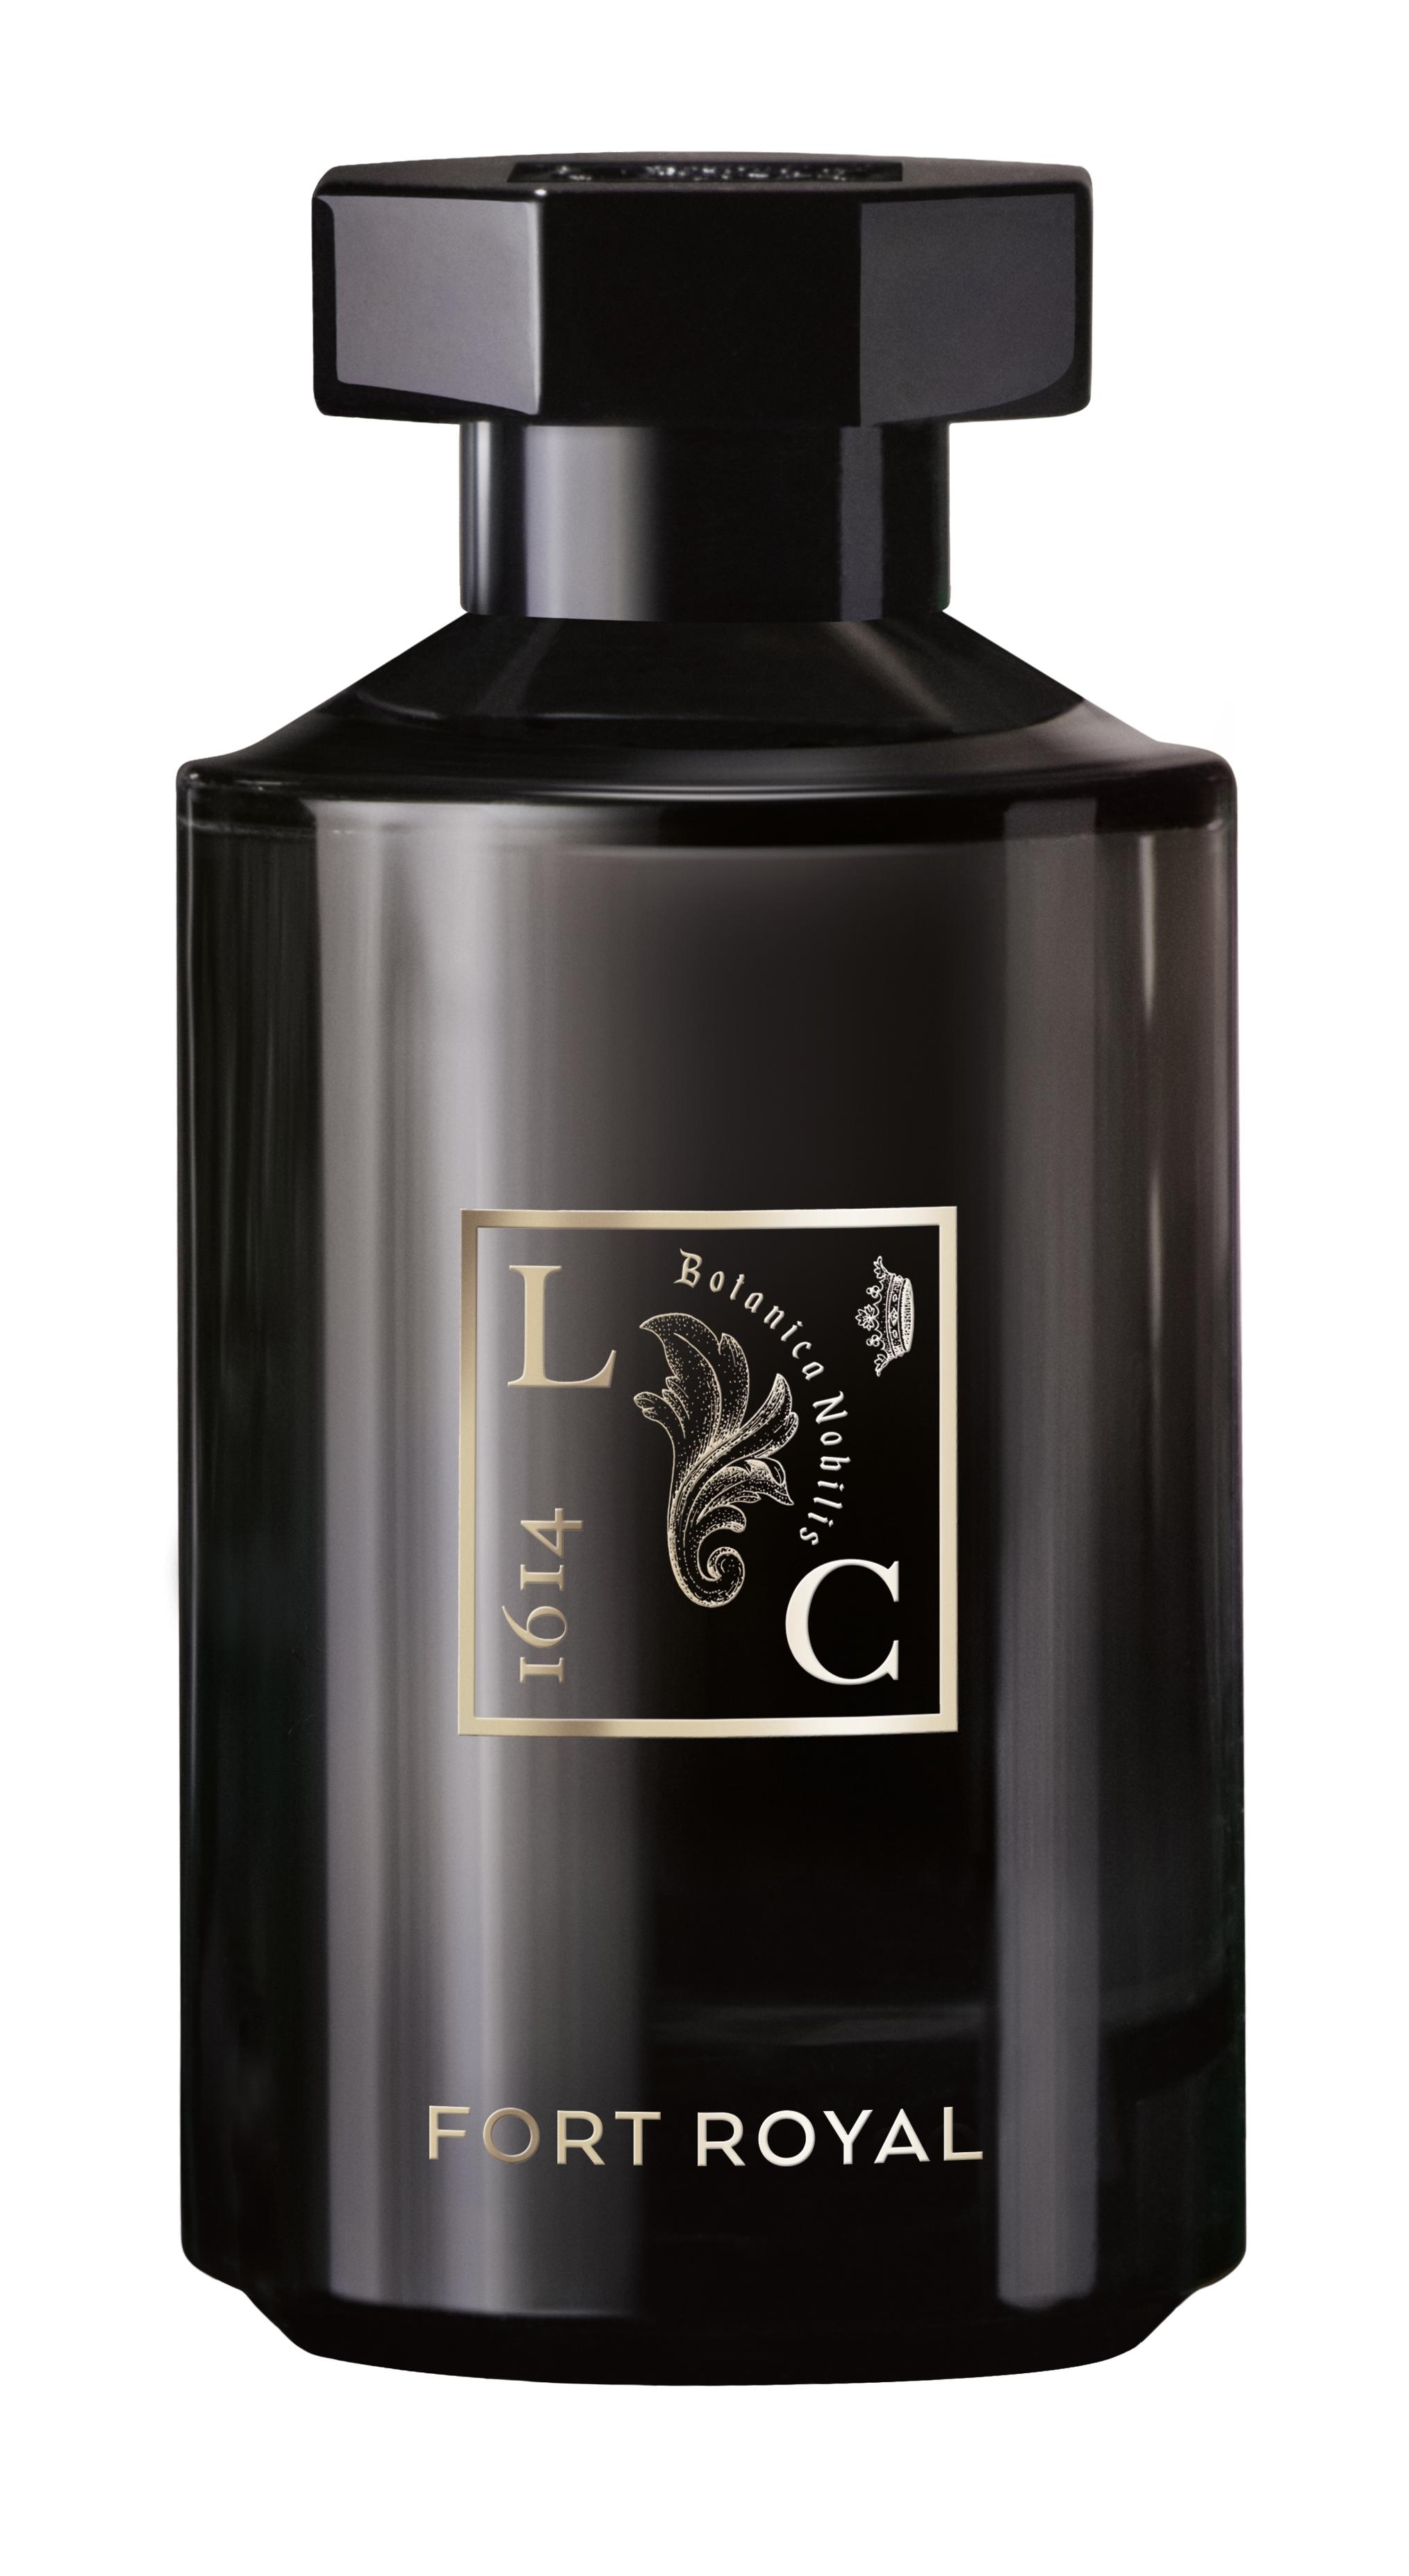 Remarkable Perfume Fort Royal Edp 100ml